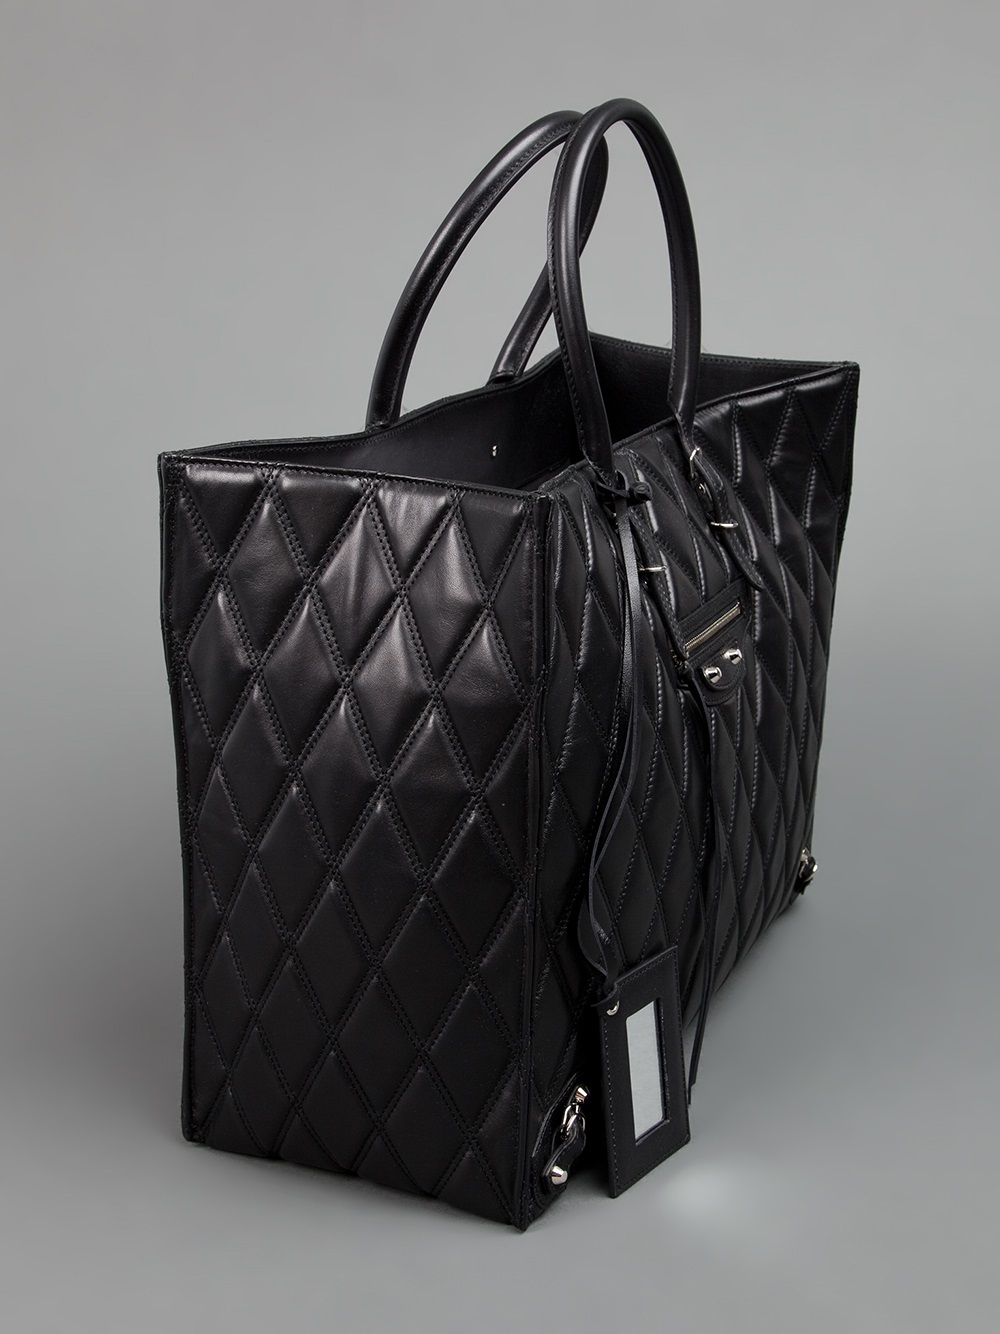 Balenciaga Black Tote. Lyst - Balenciaga Quilted Shopper ... 6fcff17d43cad